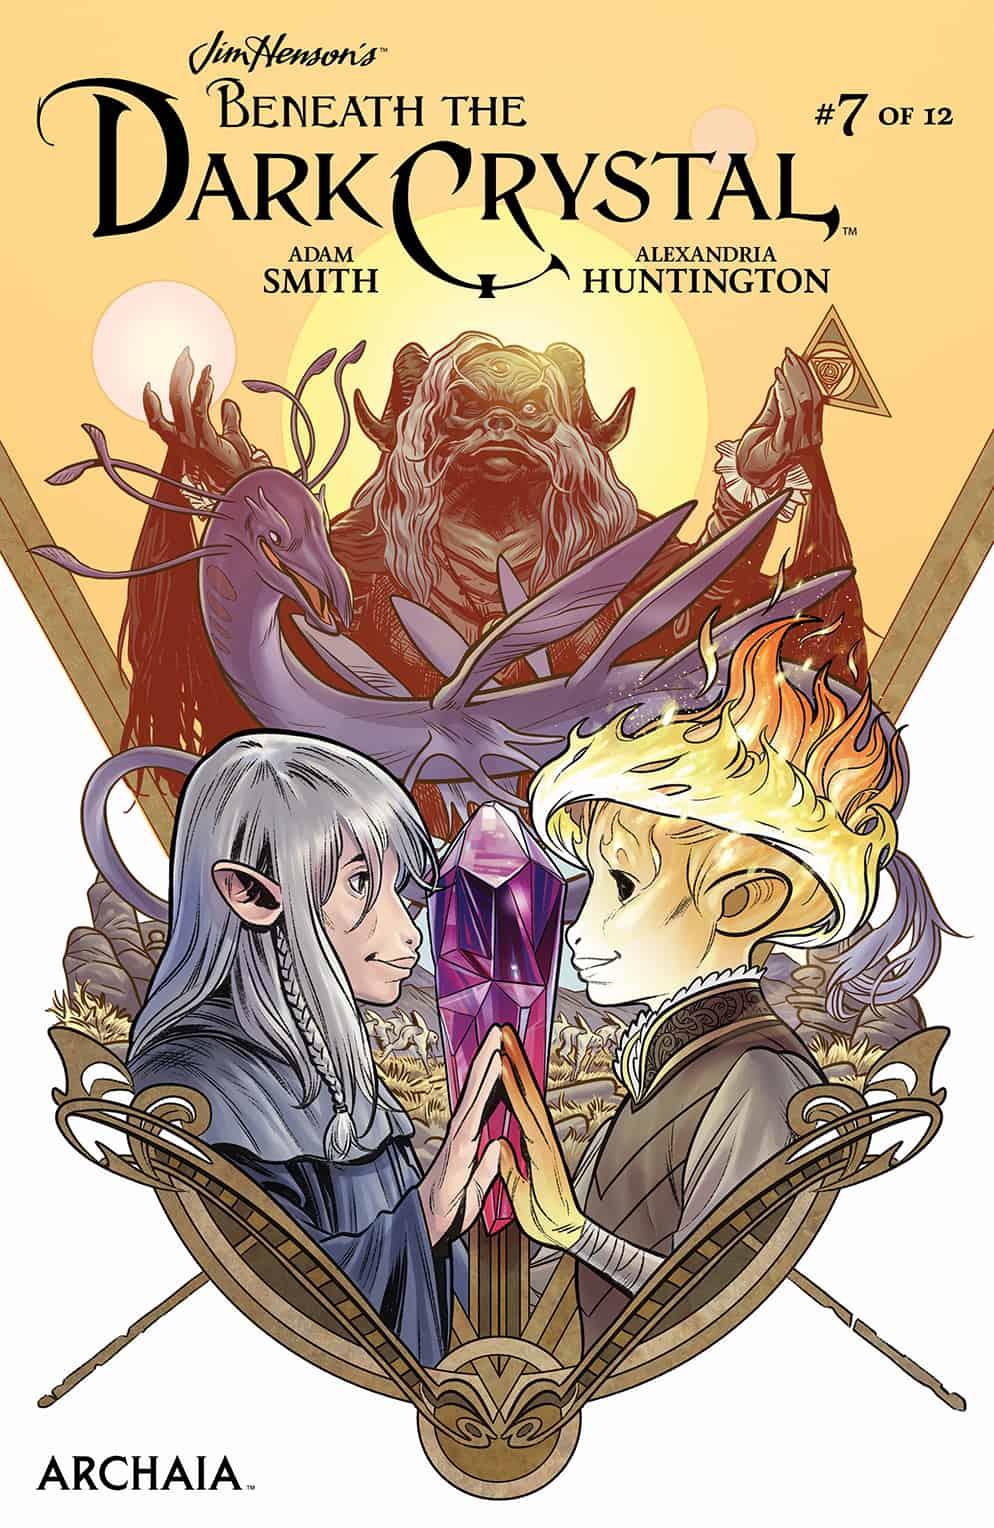 Beneath the Dark Crystal #7